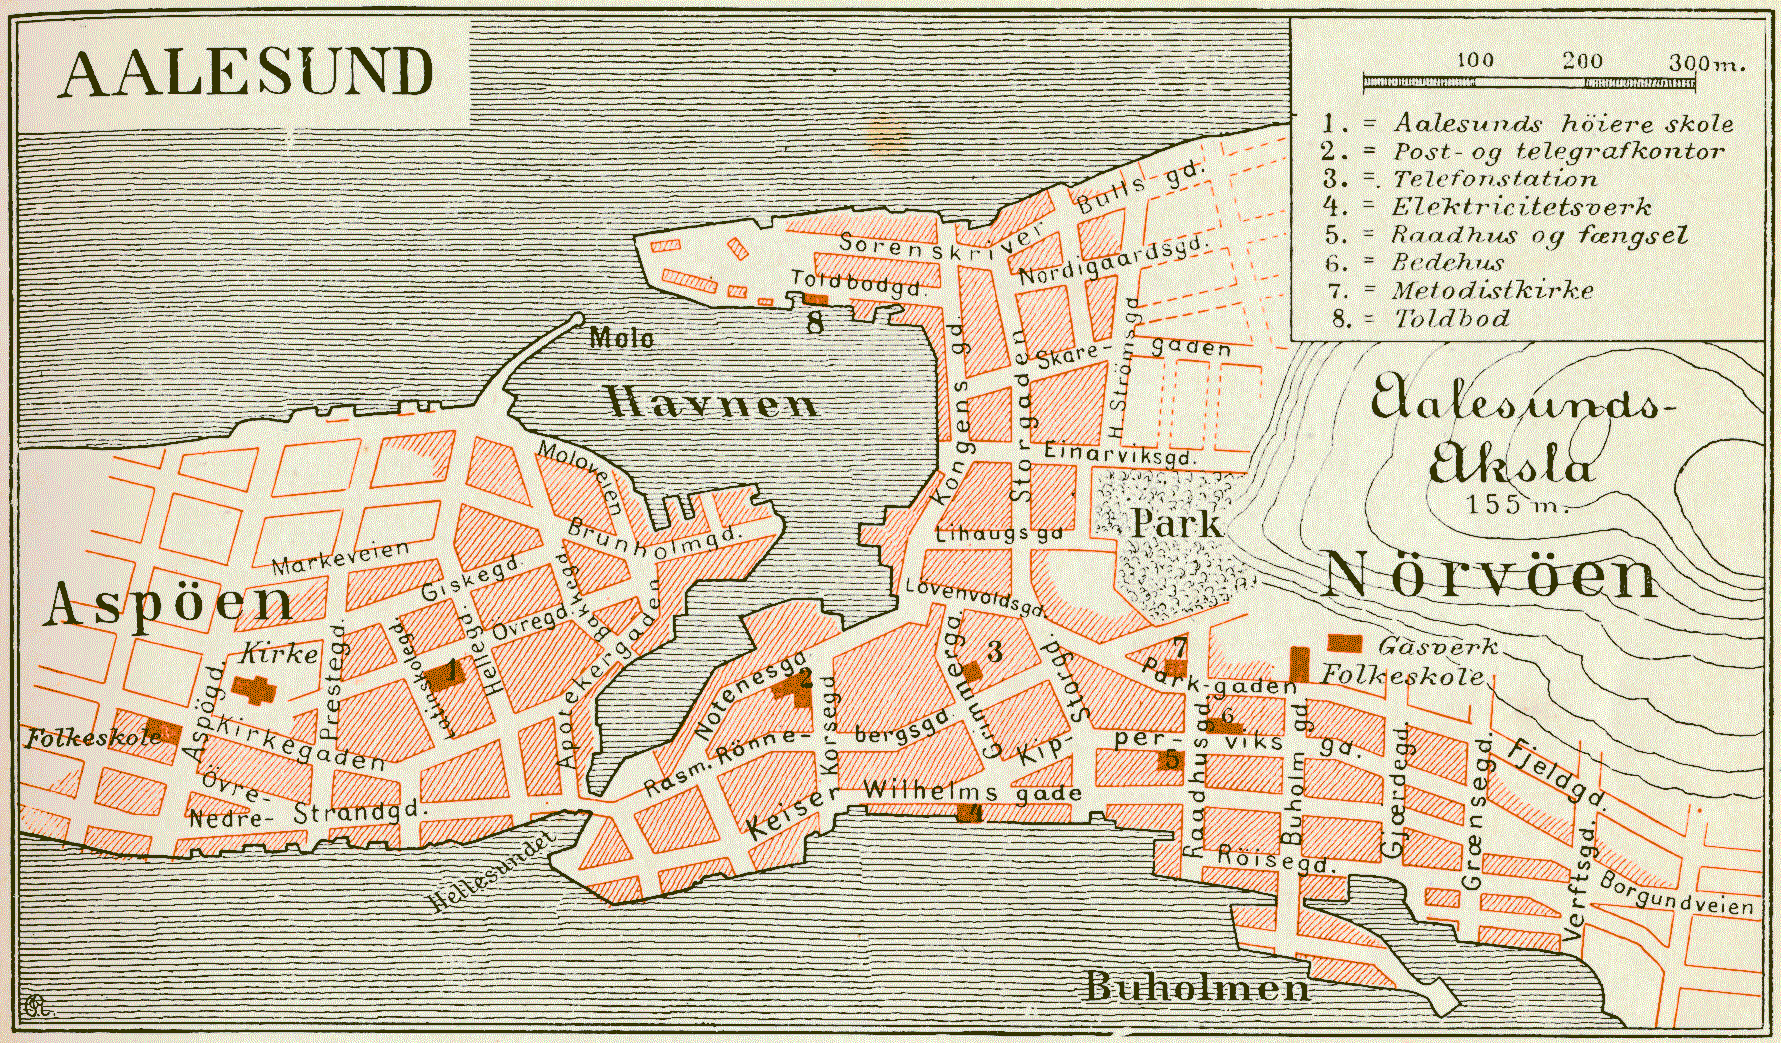 FileAalesundpng Wikimedia Commons - Norway map alesund